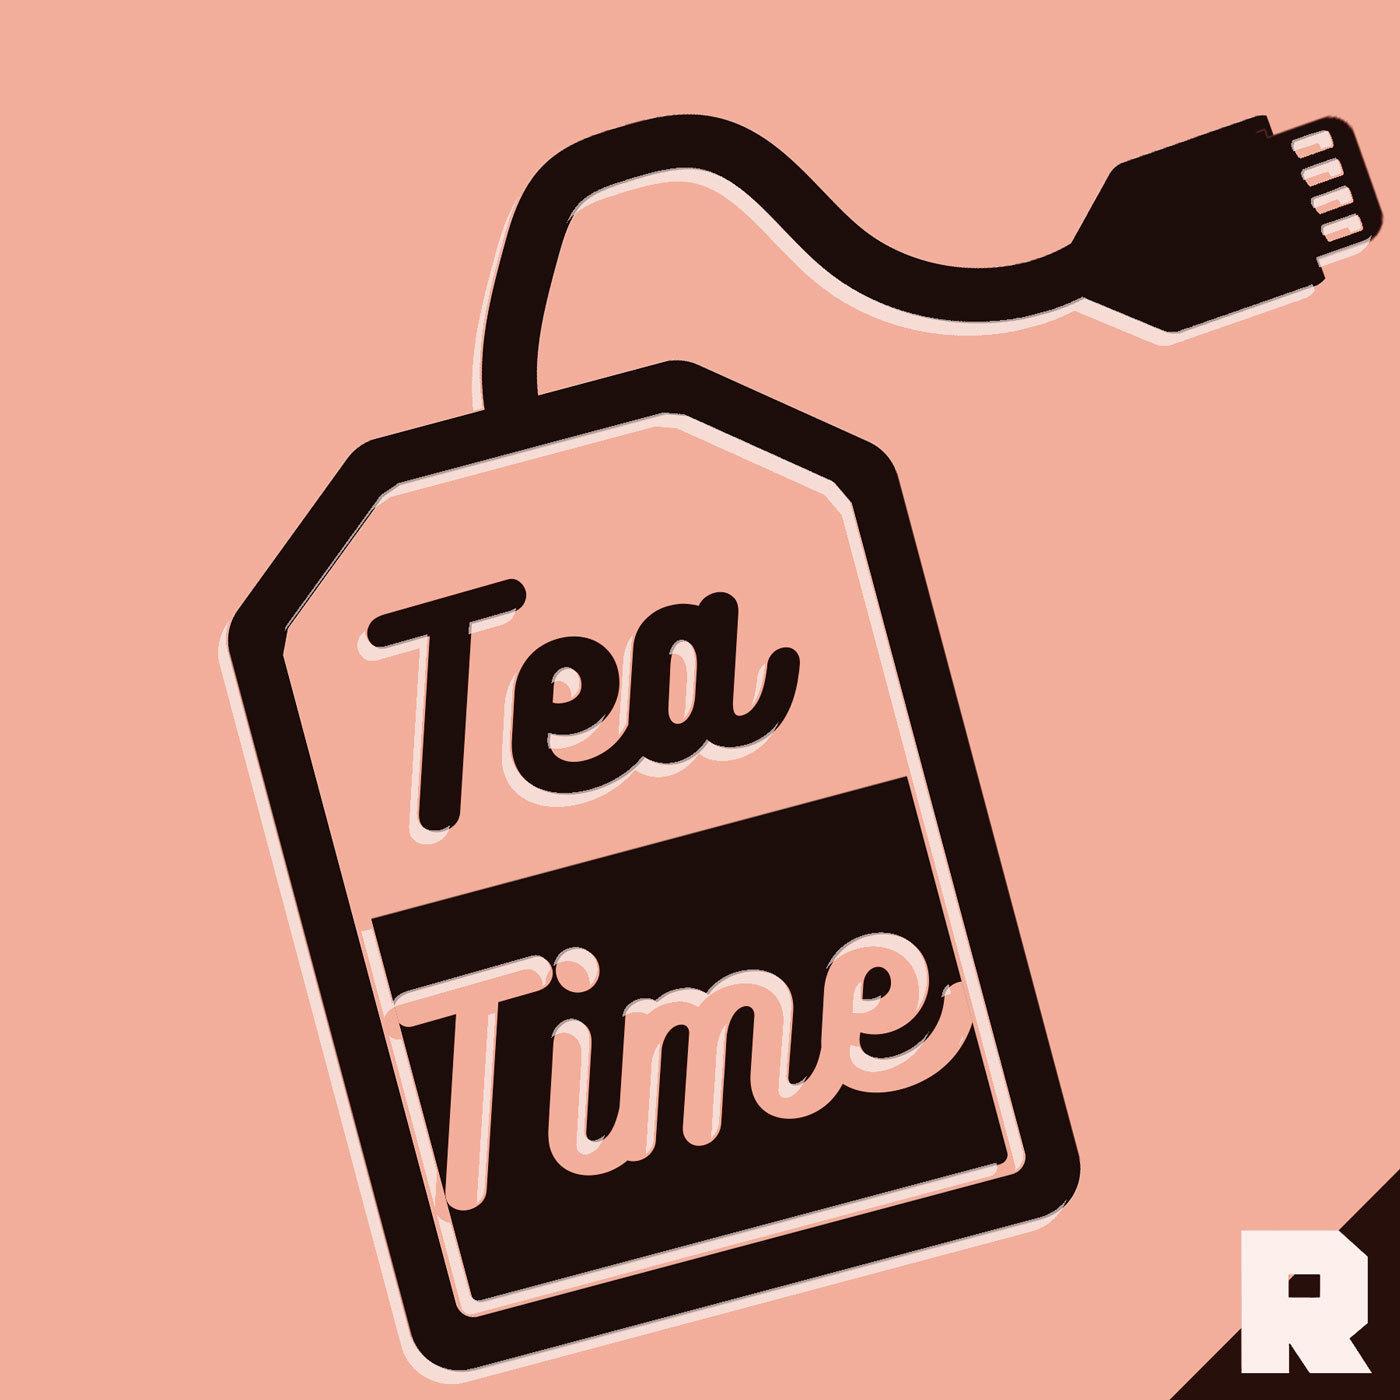 April Cover Stars, Jack Black on TikTok, and Celebrity Pap Walks | Tea Time